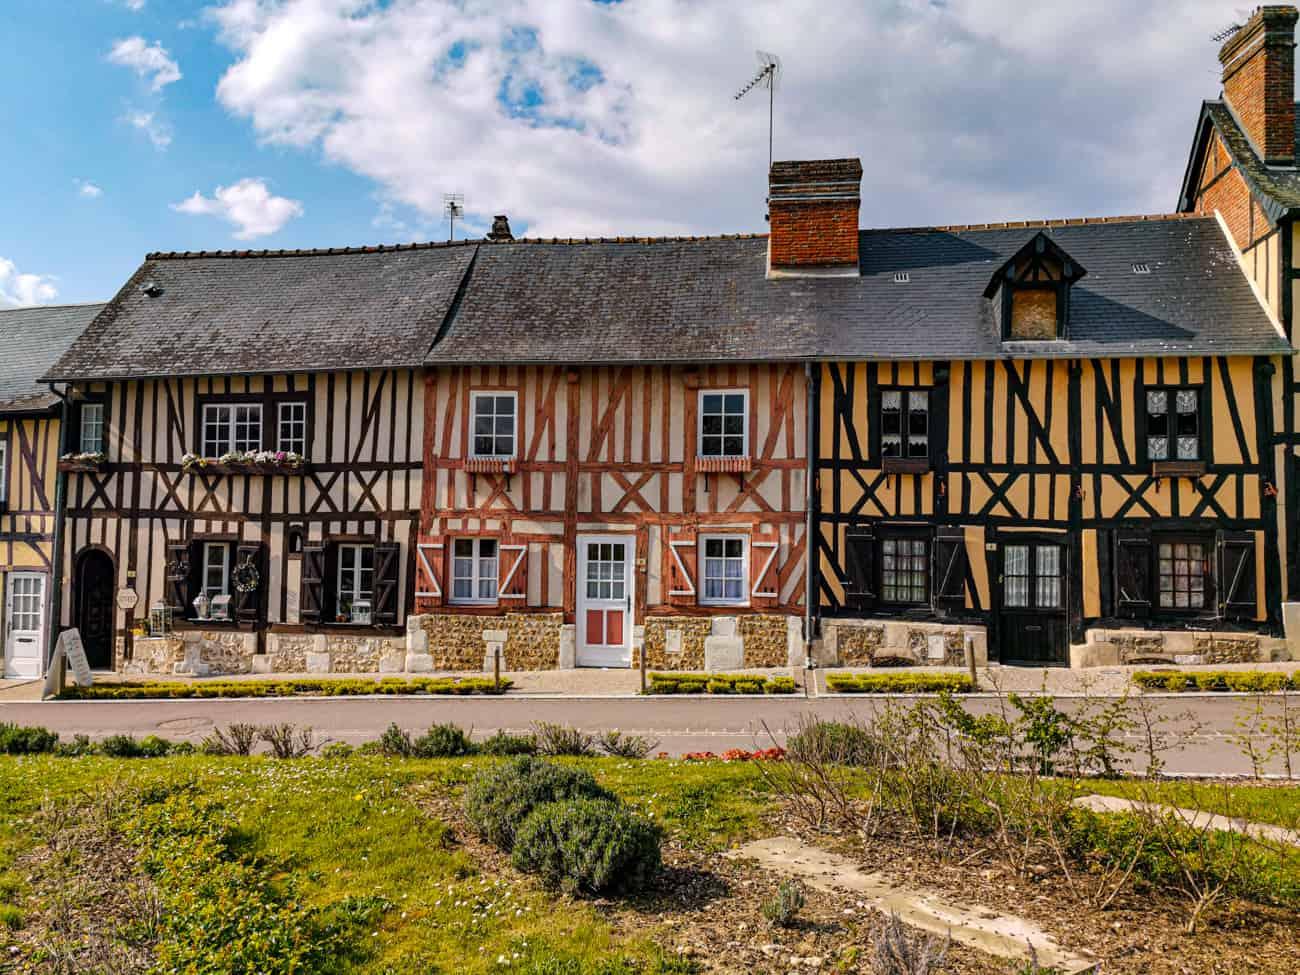 abbaye-bec-hellouin-village-2